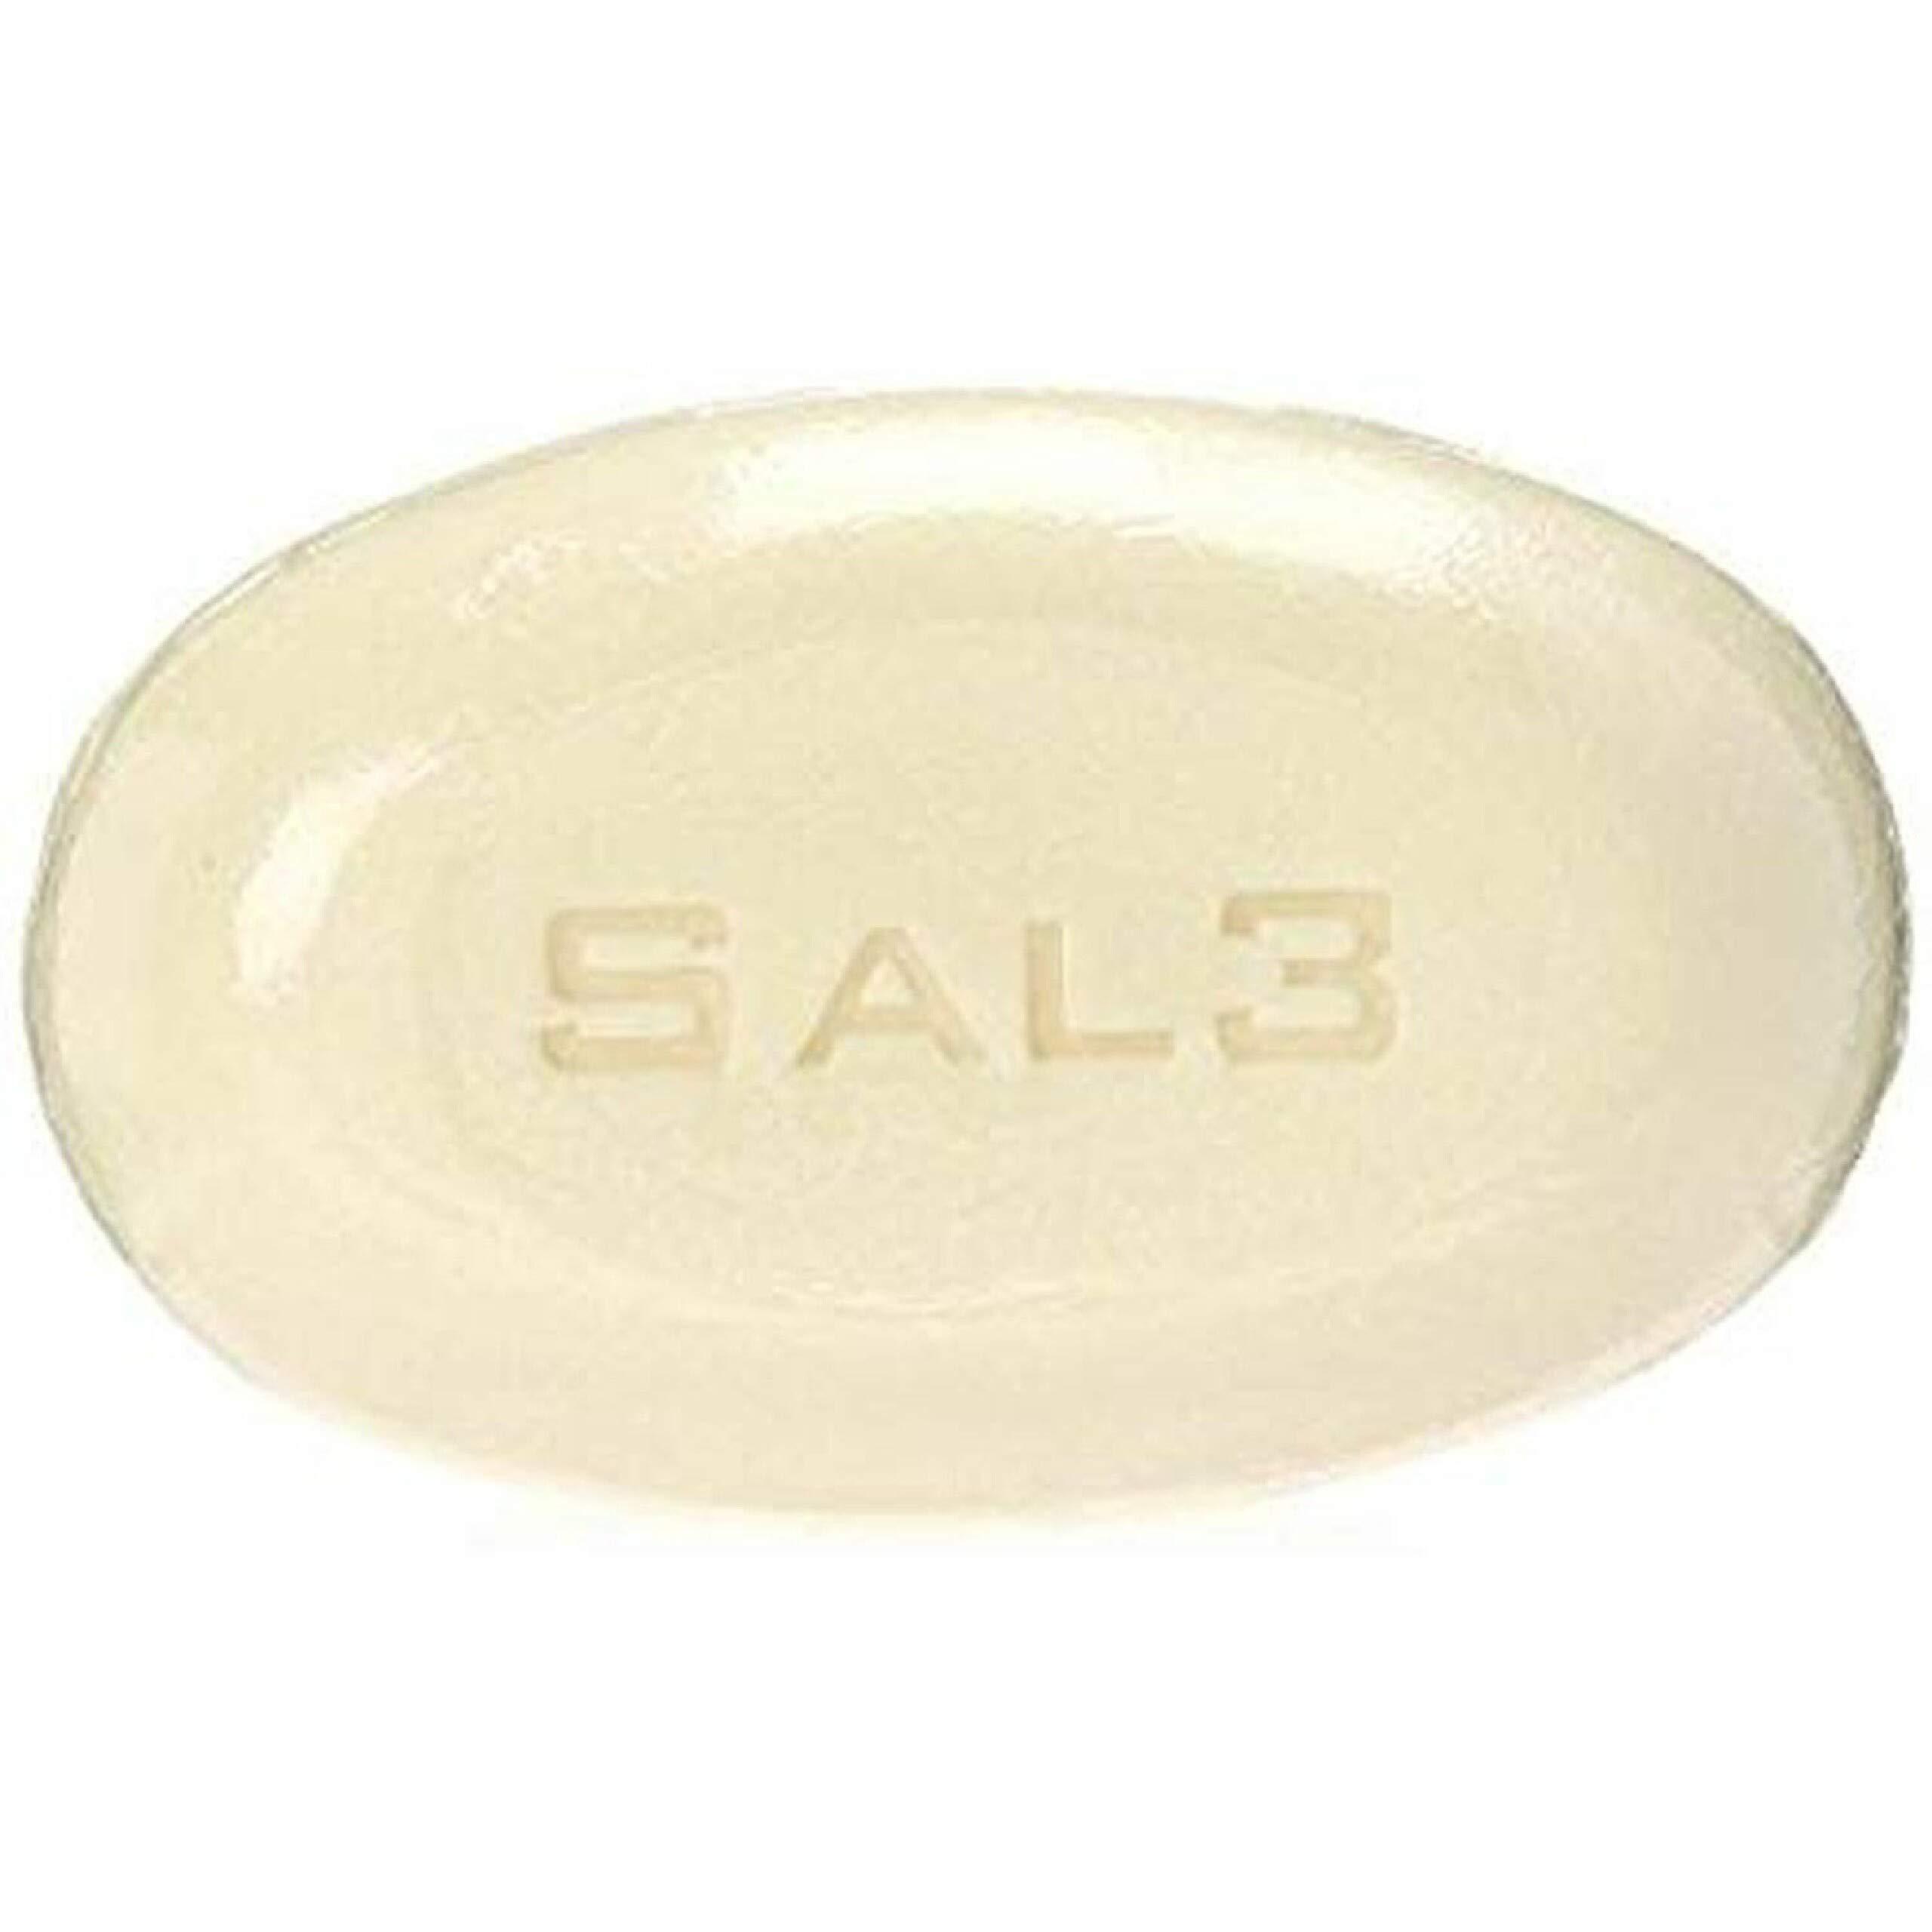 25 bar Dermatologist Pack - SAL3 Soap, 10% Sulfur, 3% Salicylic Acid by SAL3 (Image #6)